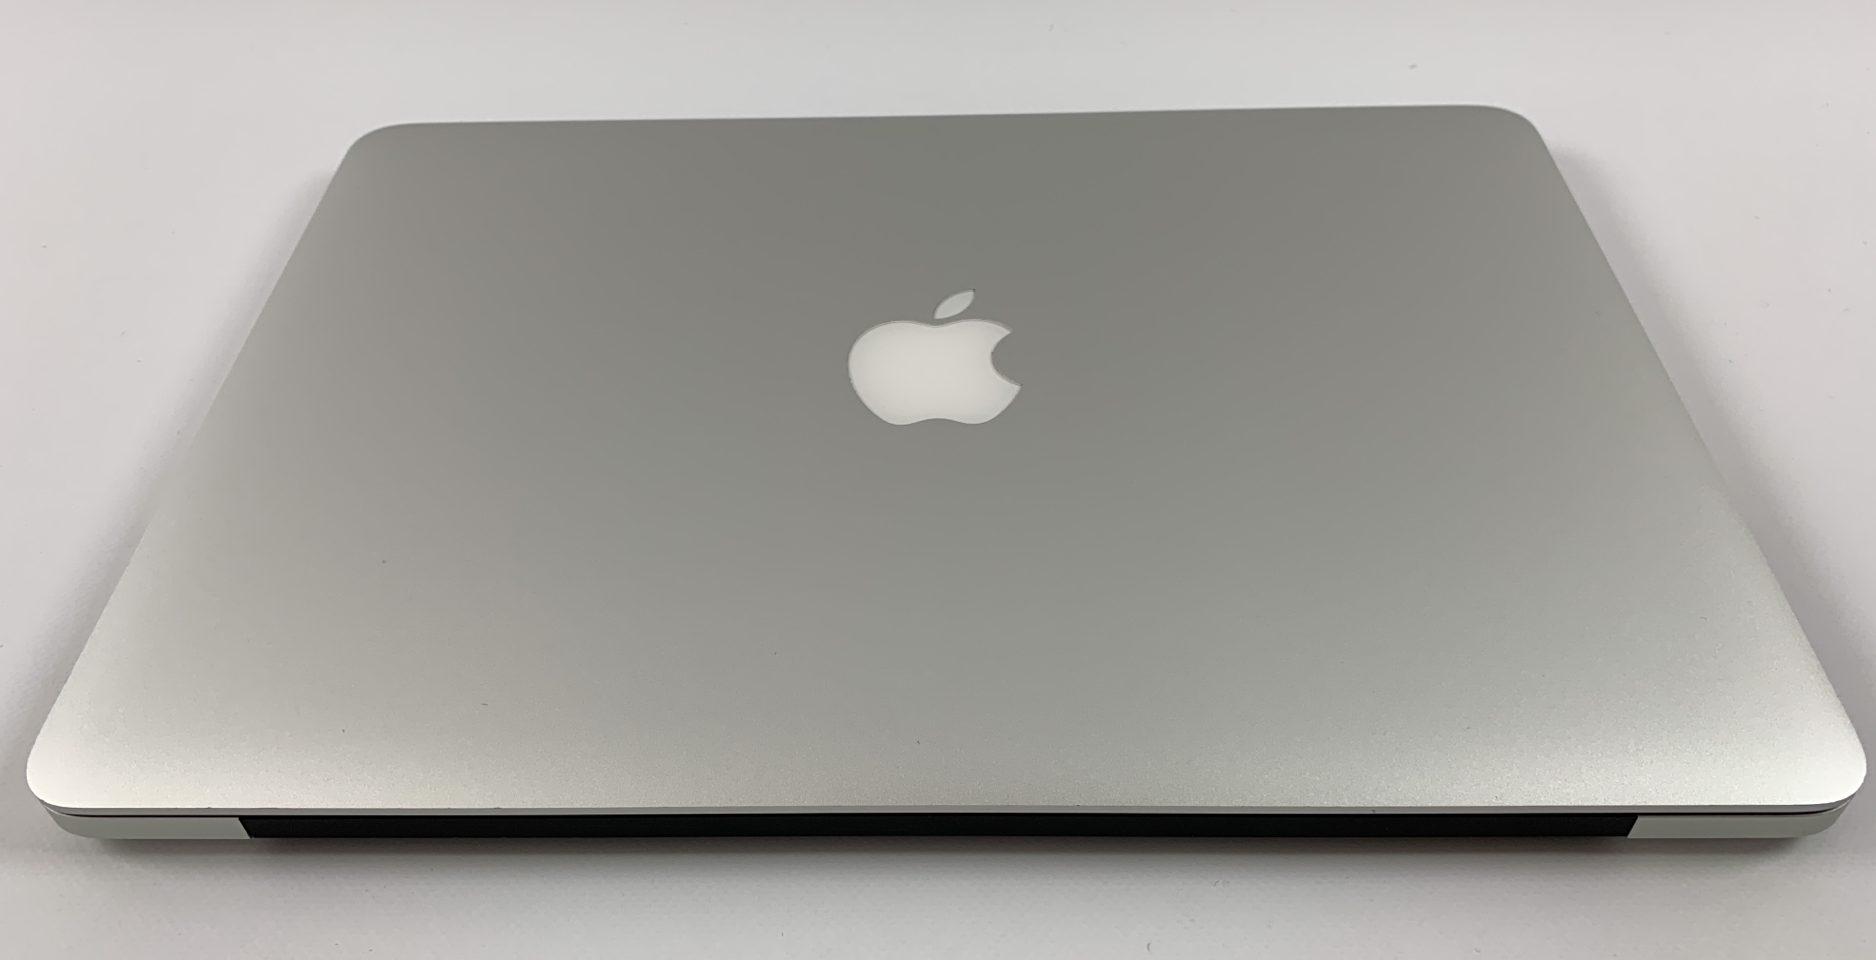 "MacBook Pro Retina 13"" Early 2015 (Intel Core i5 2.7 GHz 8 GB RAM 256 GB SSD), Intel Core i5 2.7 GHz, 8 GB RAM, 256 GB SSD, Afbeelding 2"